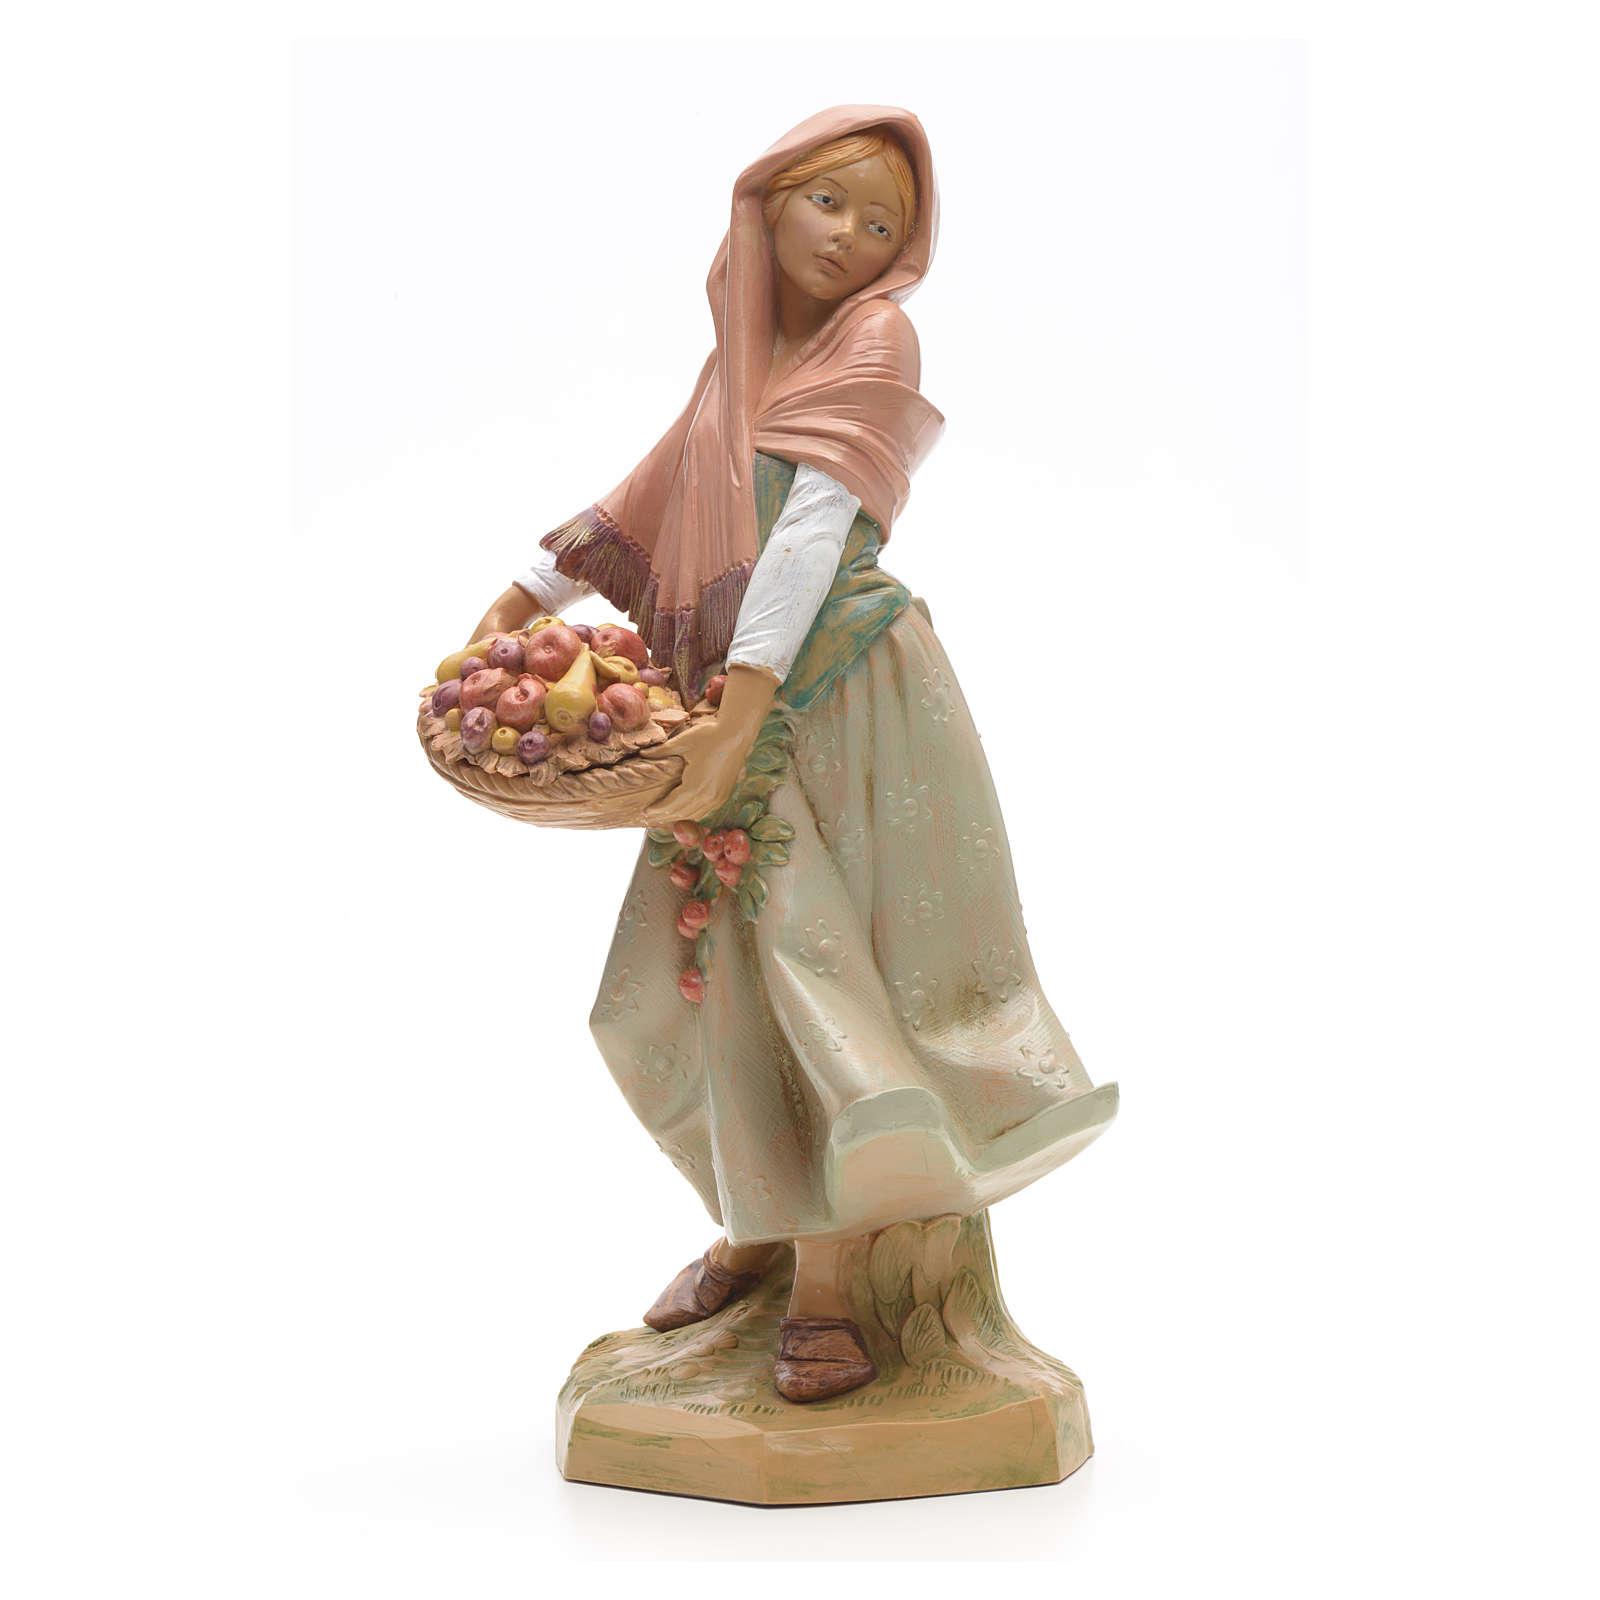 Rapariga com cesta de fruta 30 cm Fontanini 4